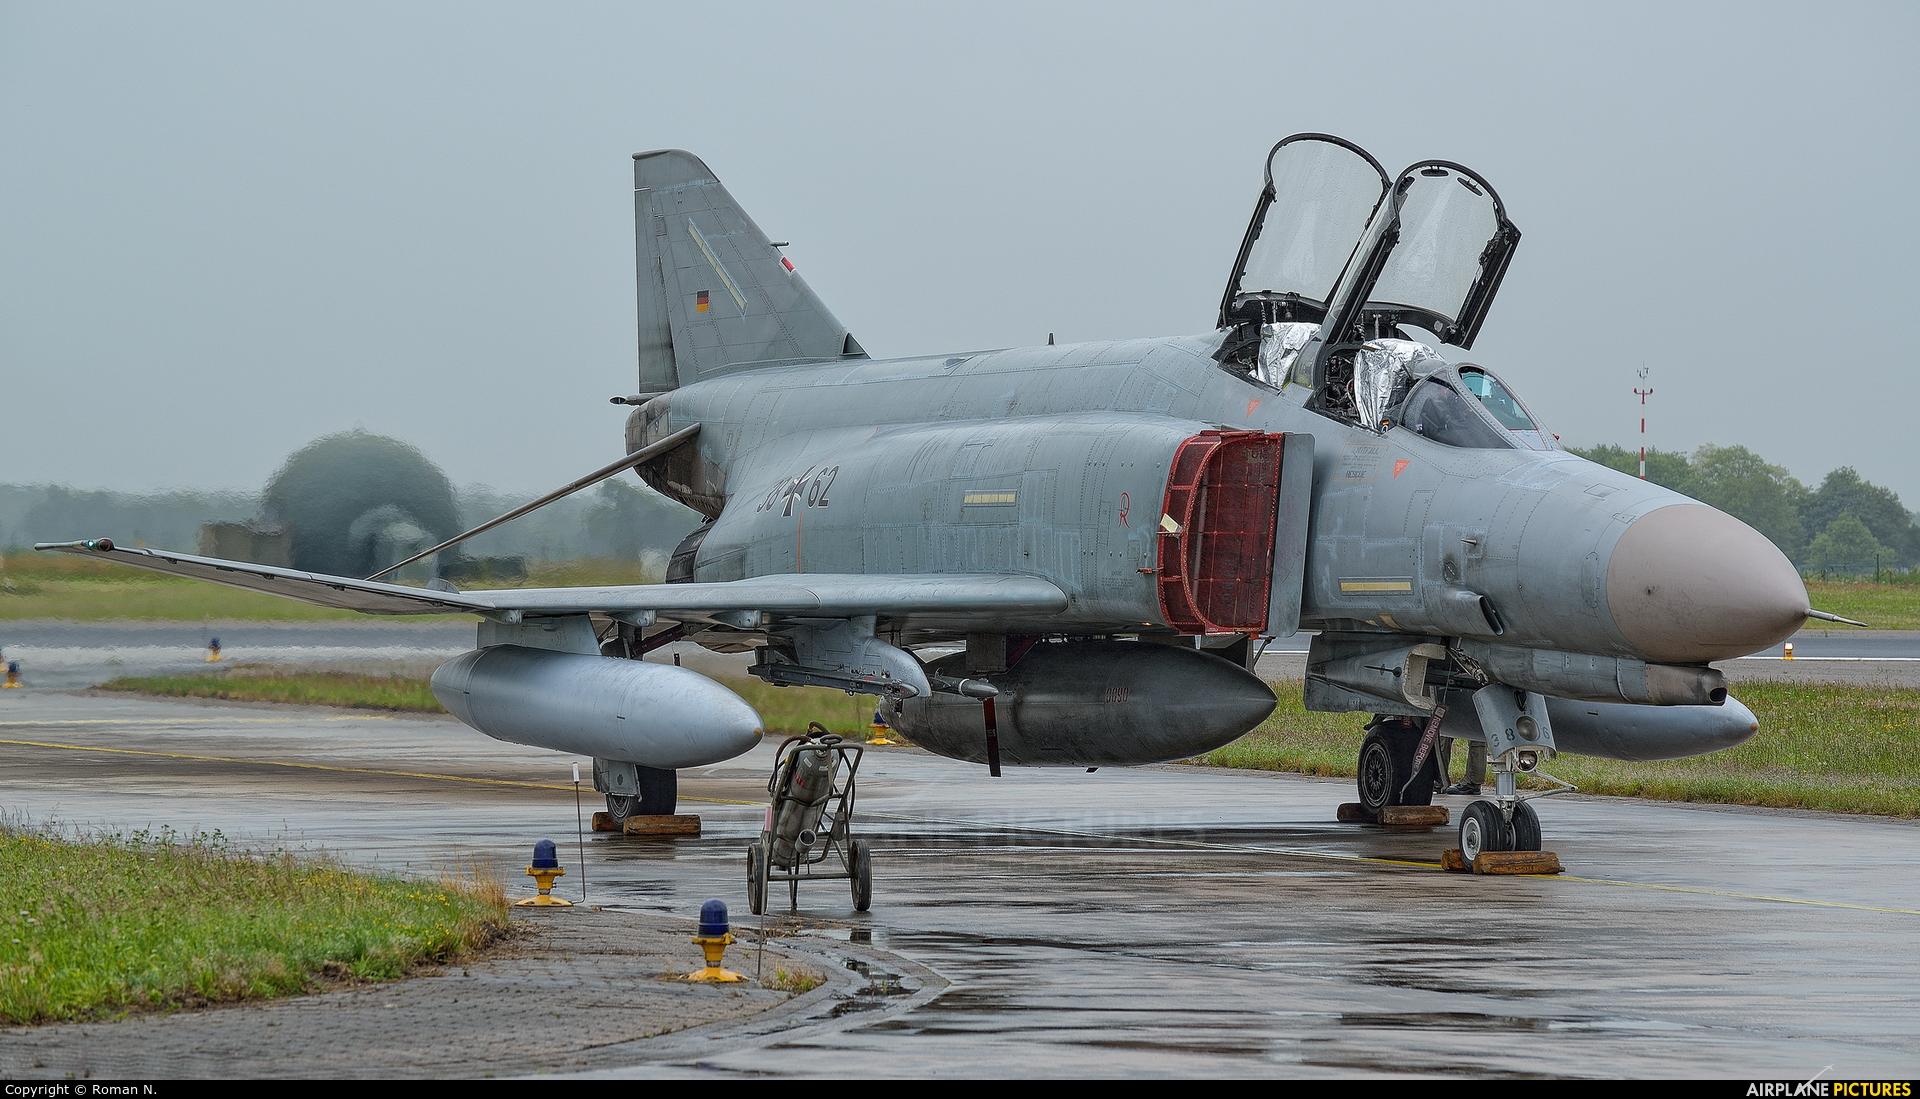 Germany - Air Force 38+62 aircraft at Wittmundhafen